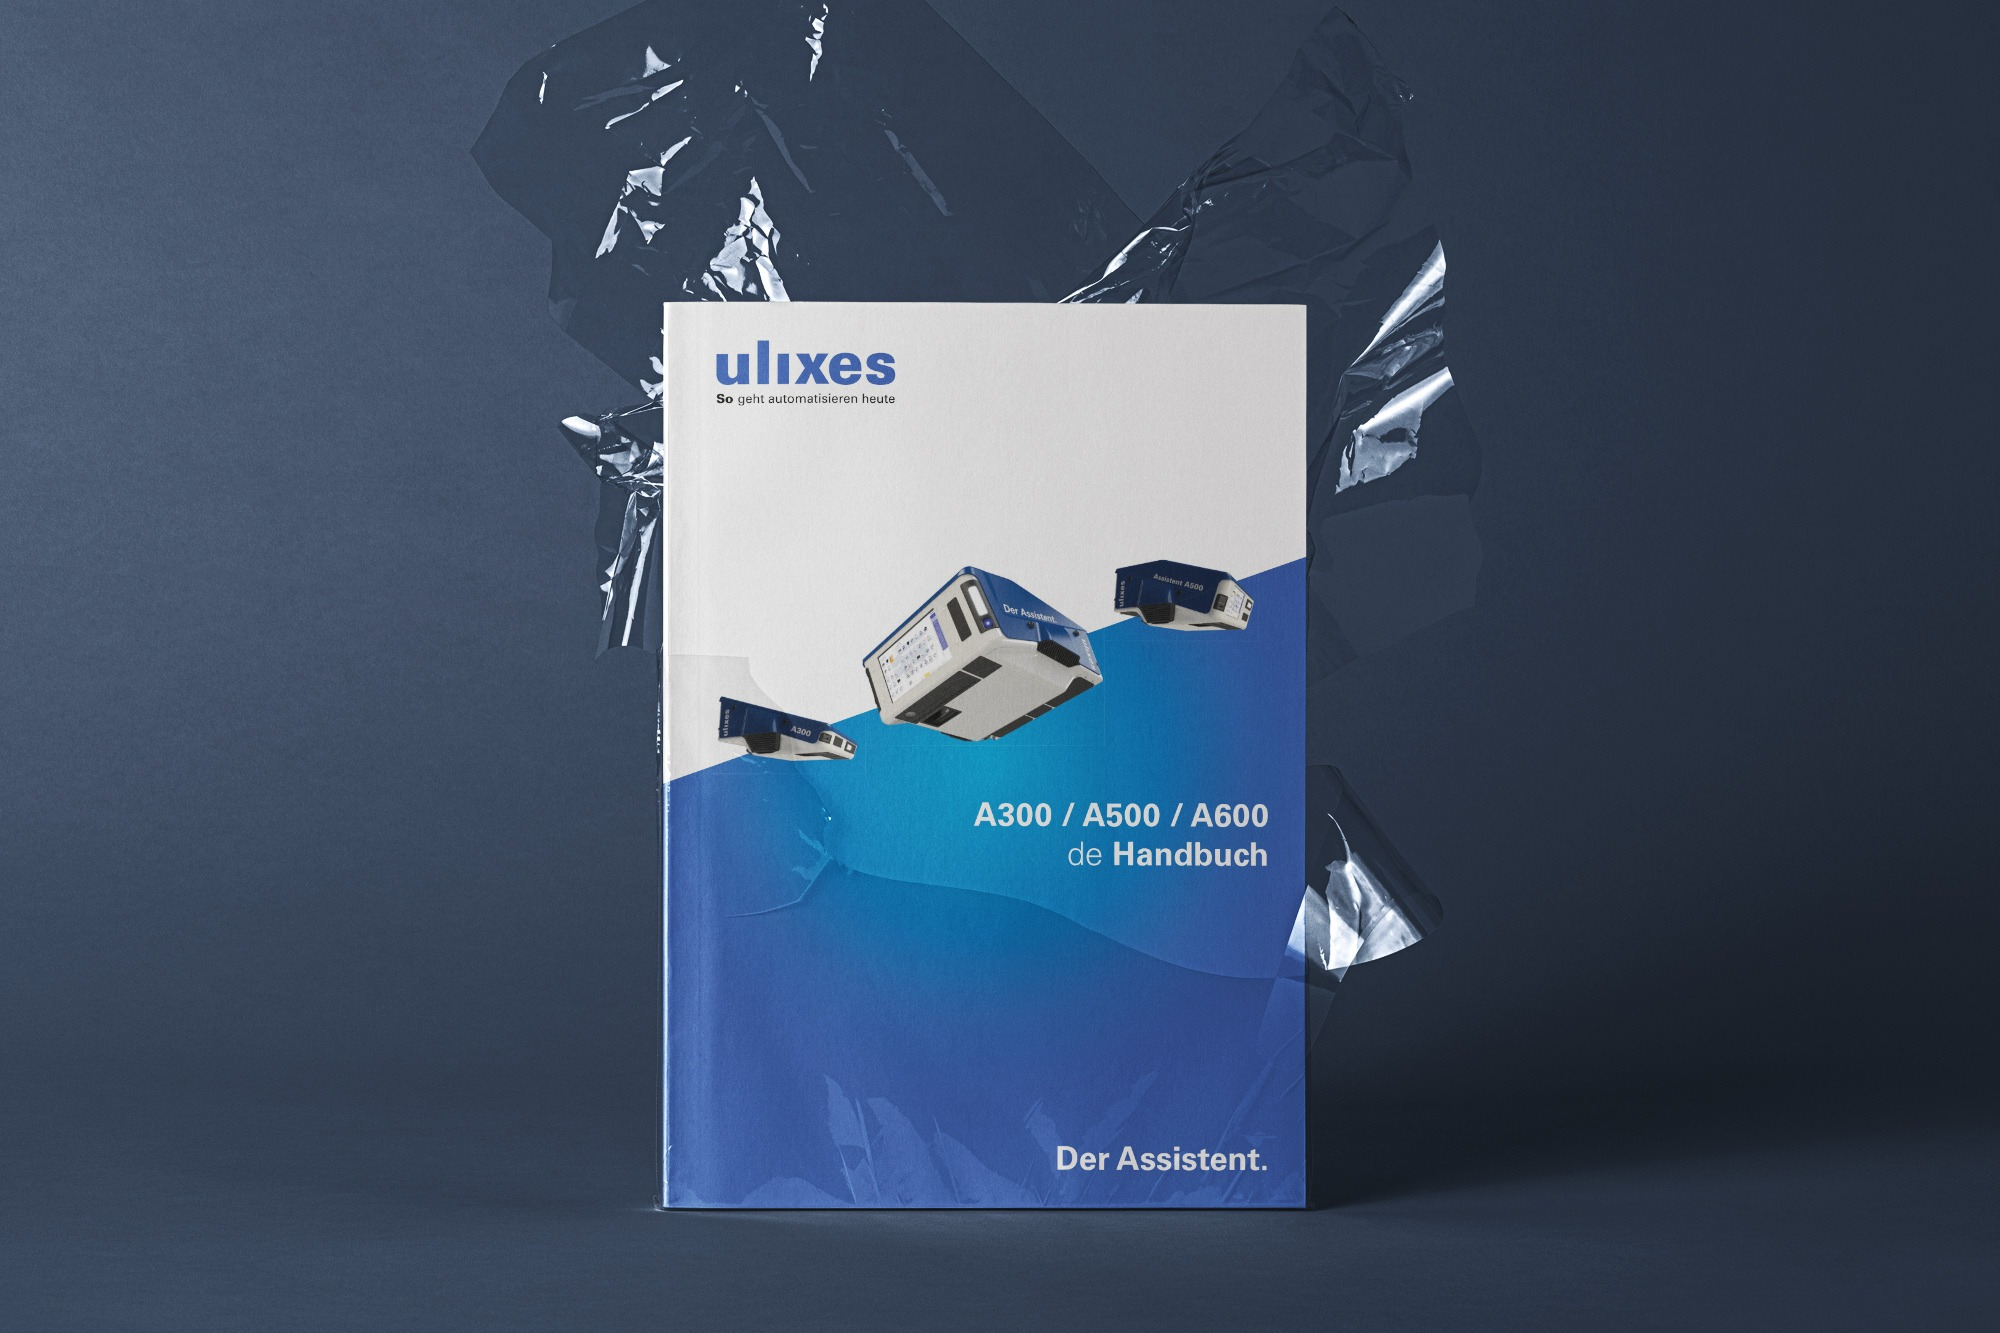 Studio dos, Grafikdesign Osnabrück, ulixes Robotersysteme Handbuch